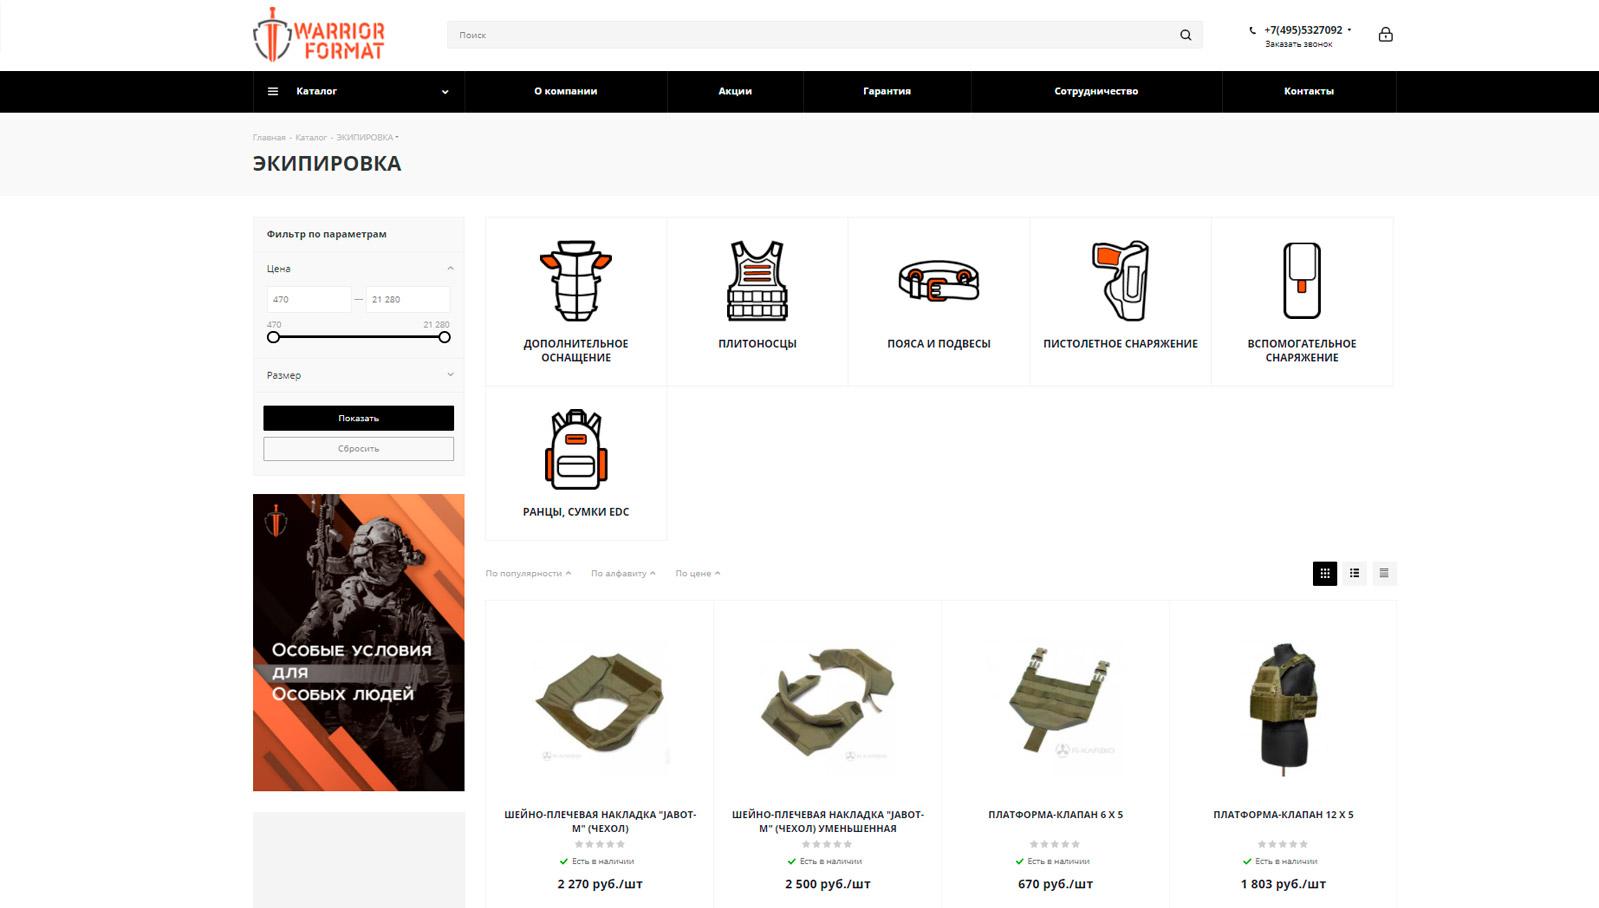 SPS_sajt_warrior-format.ru4